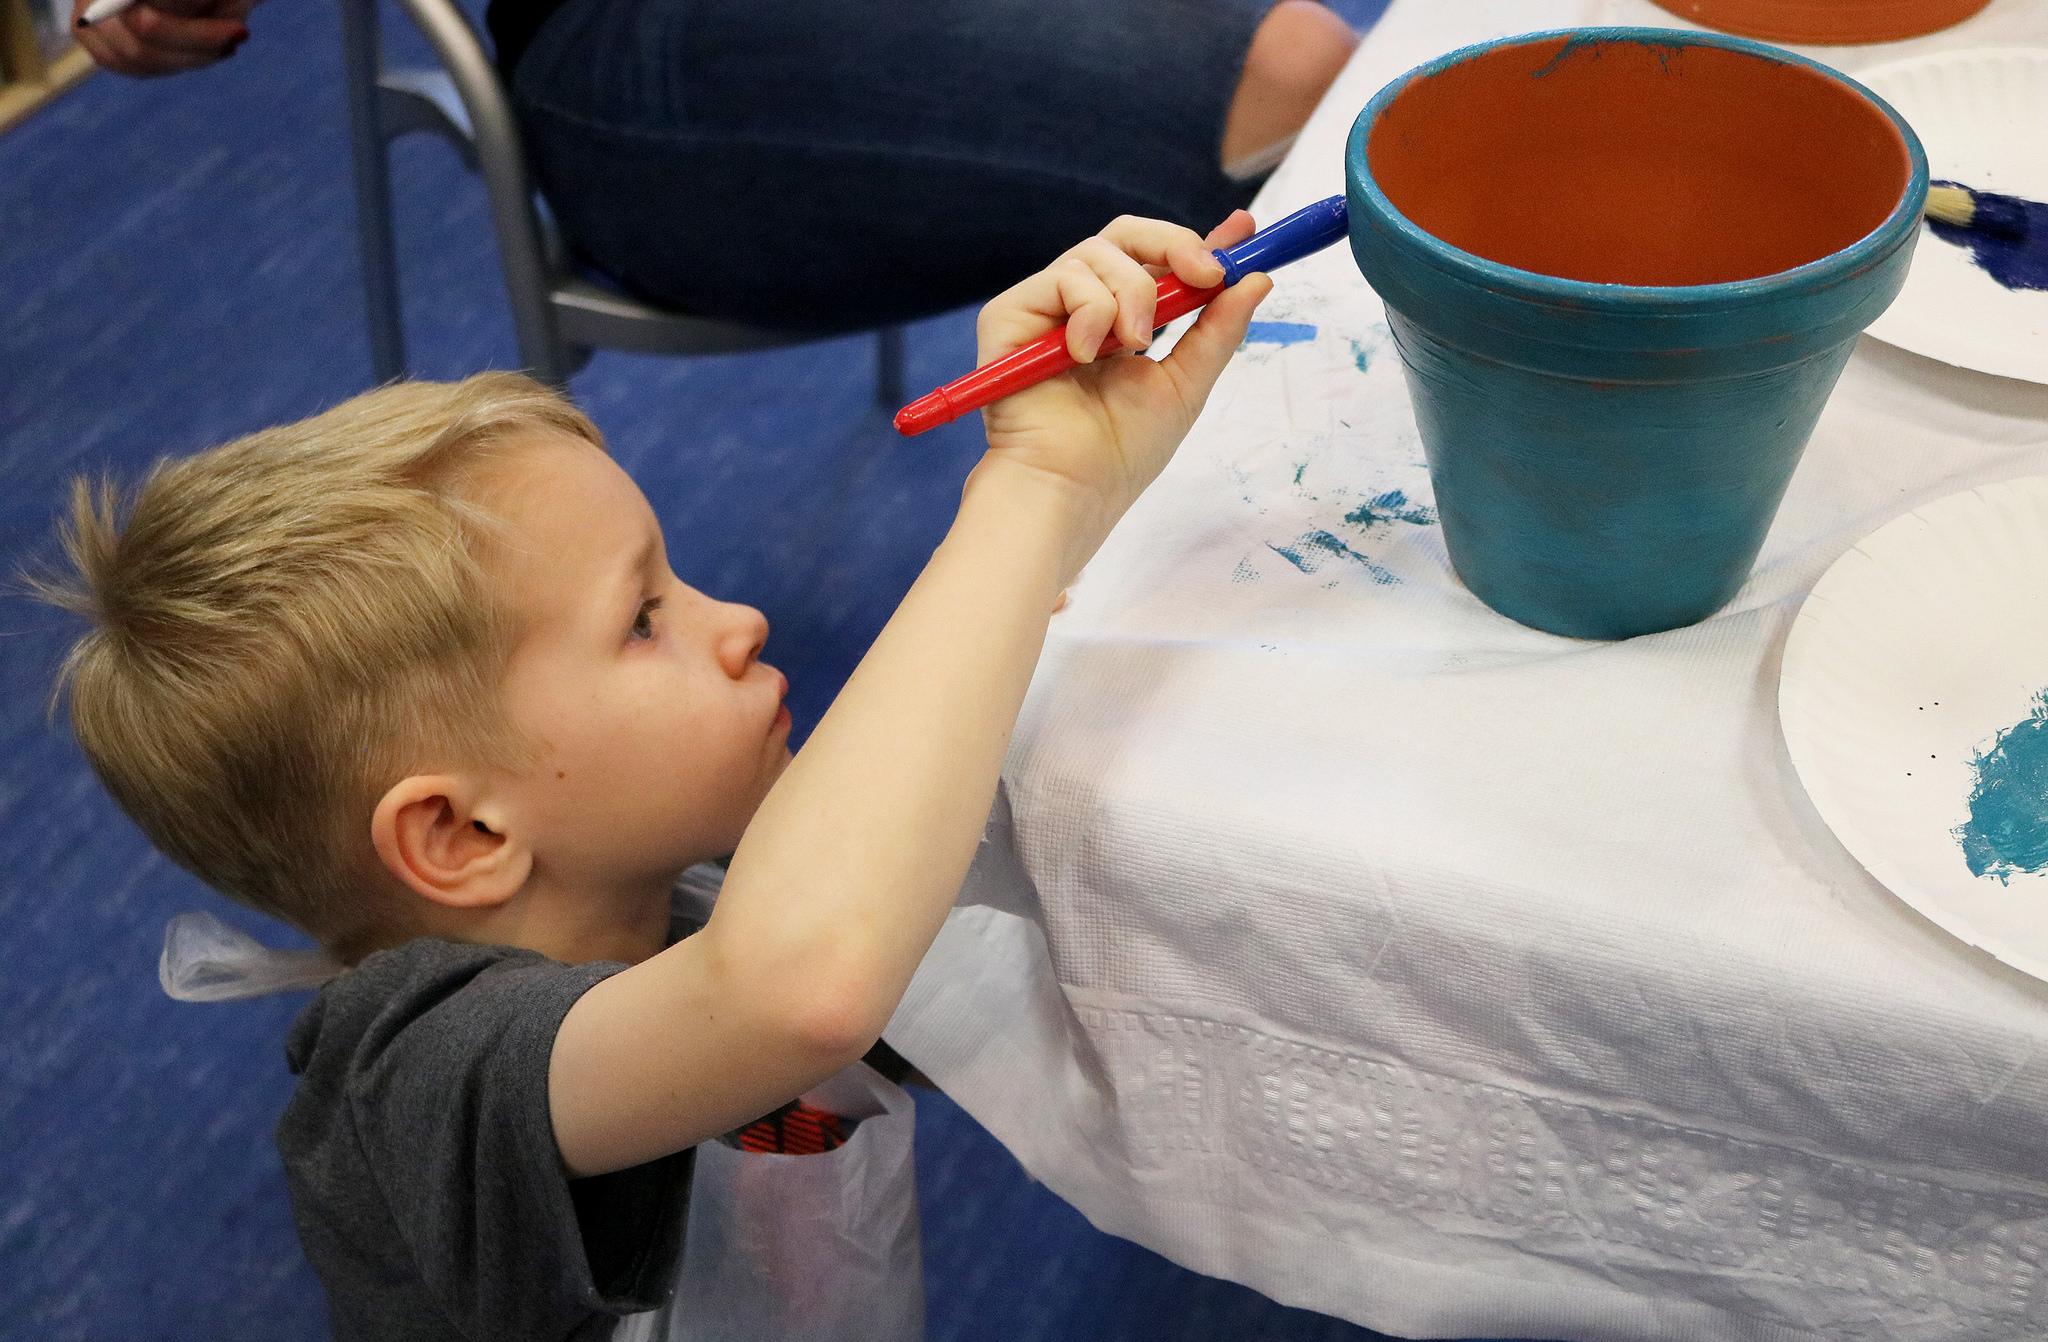 Abram painting pot